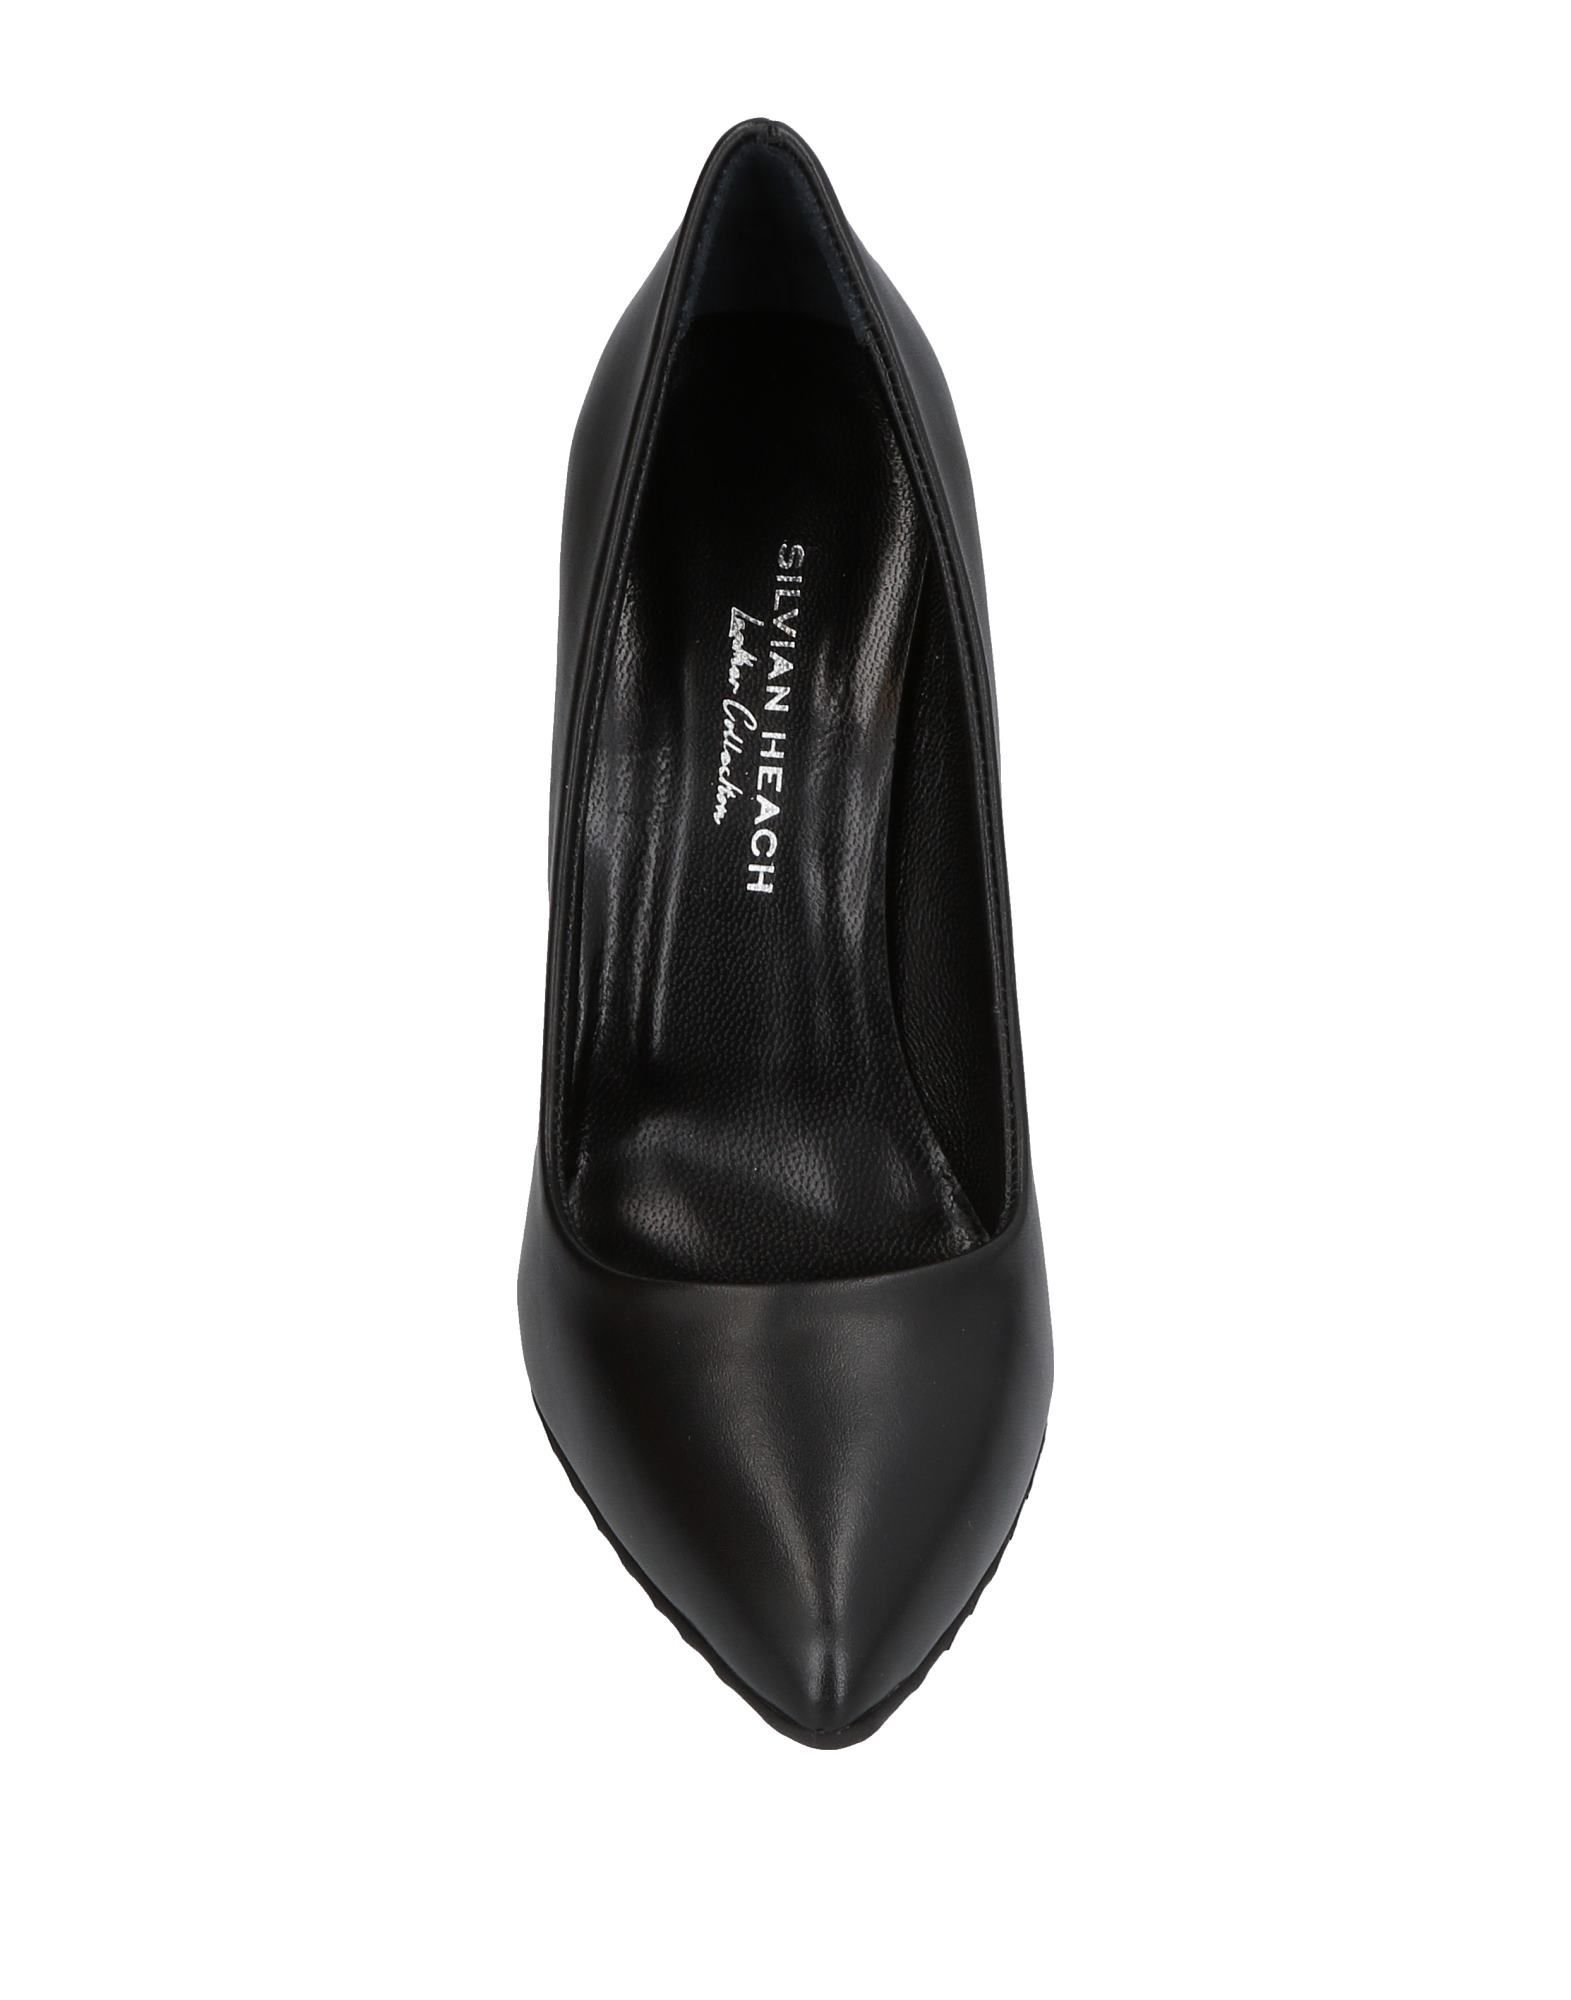 Silvian Heach Black Leather Heels